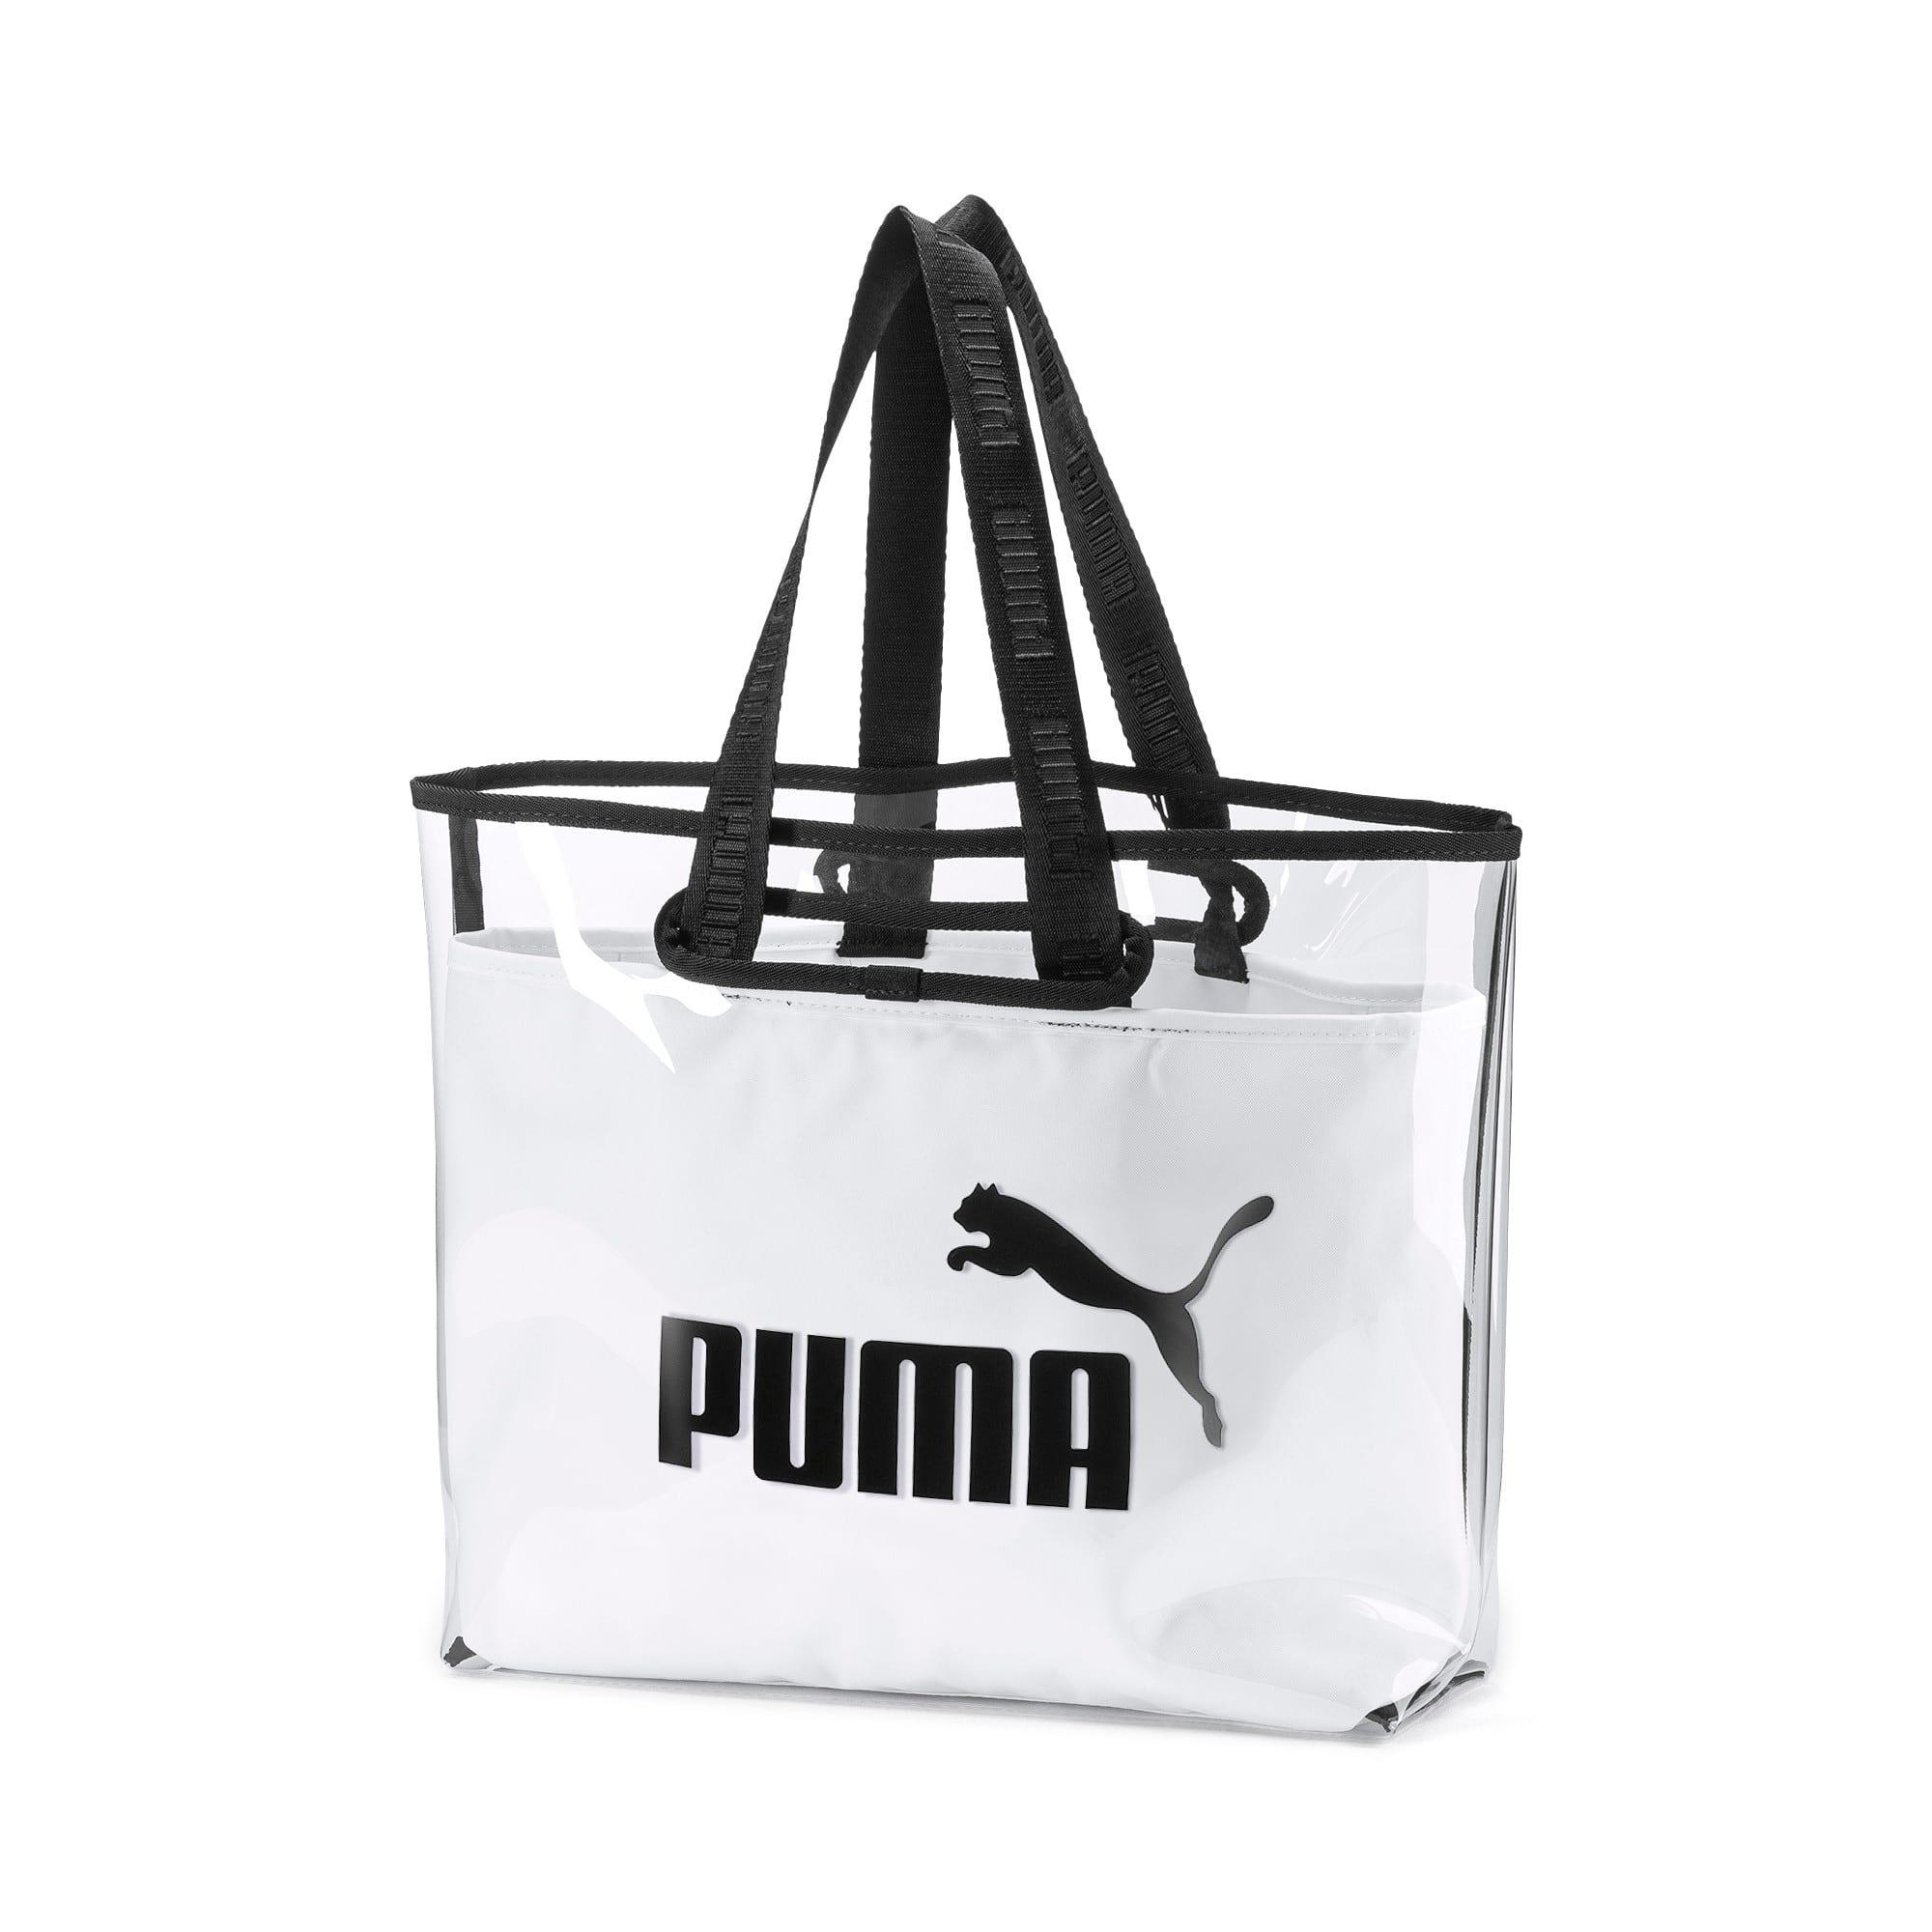 Thumbnail 1 of Women's Twin Shopper, Puma White, medium